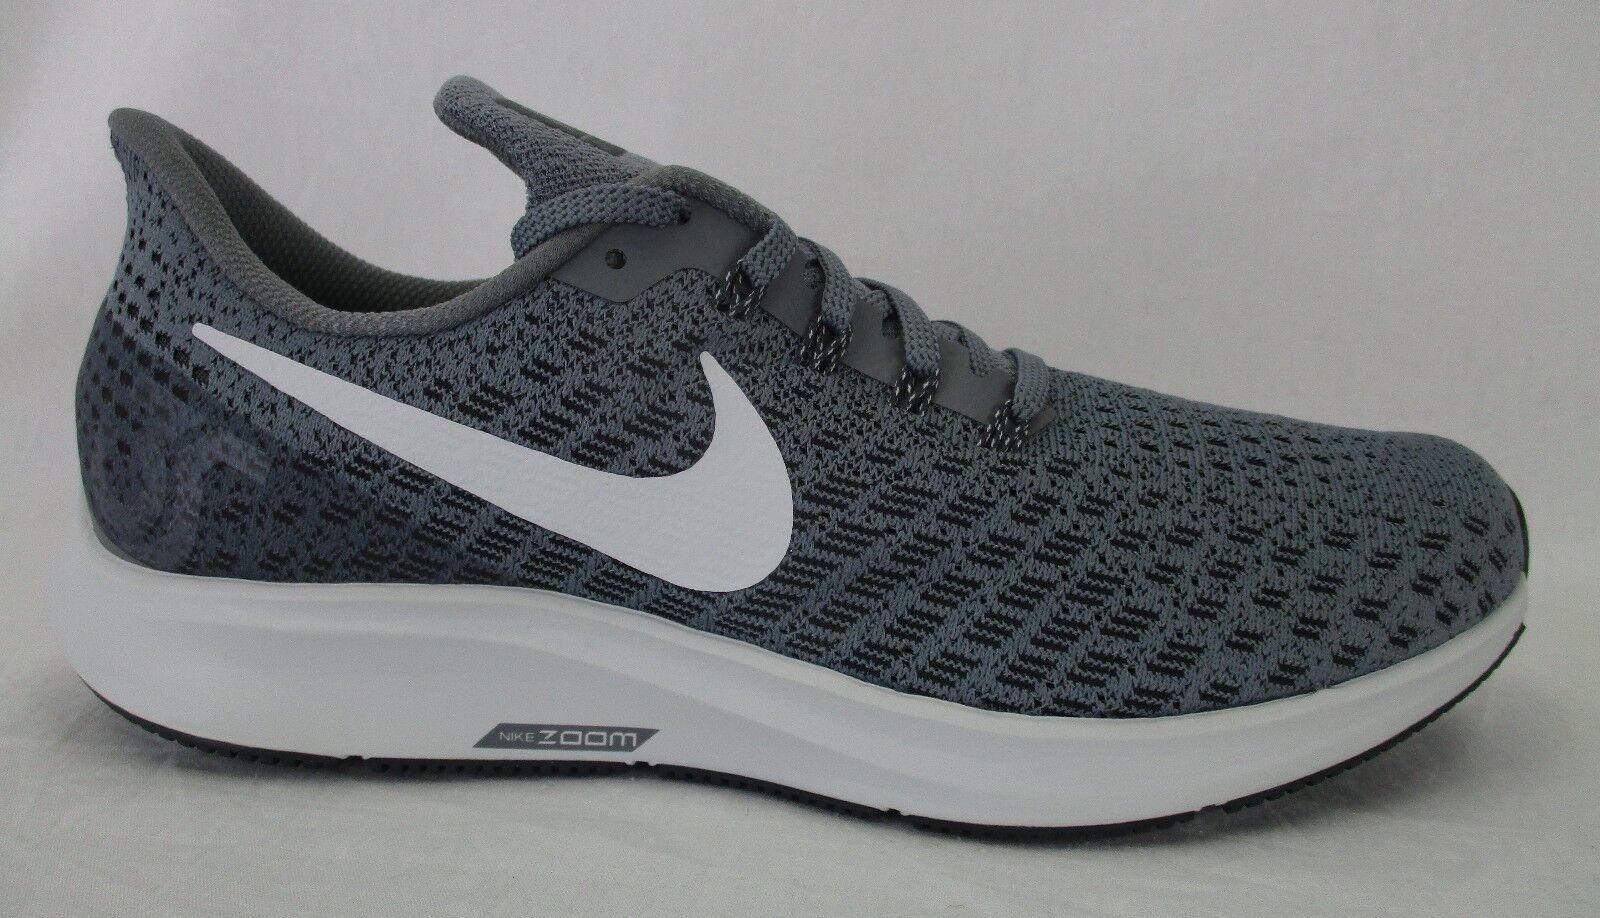 Nike Hommes Air 942851 Zoom Pegasus 35 Chaussures 942851 Air 005 Cool Gris /Pure Platinum 951360